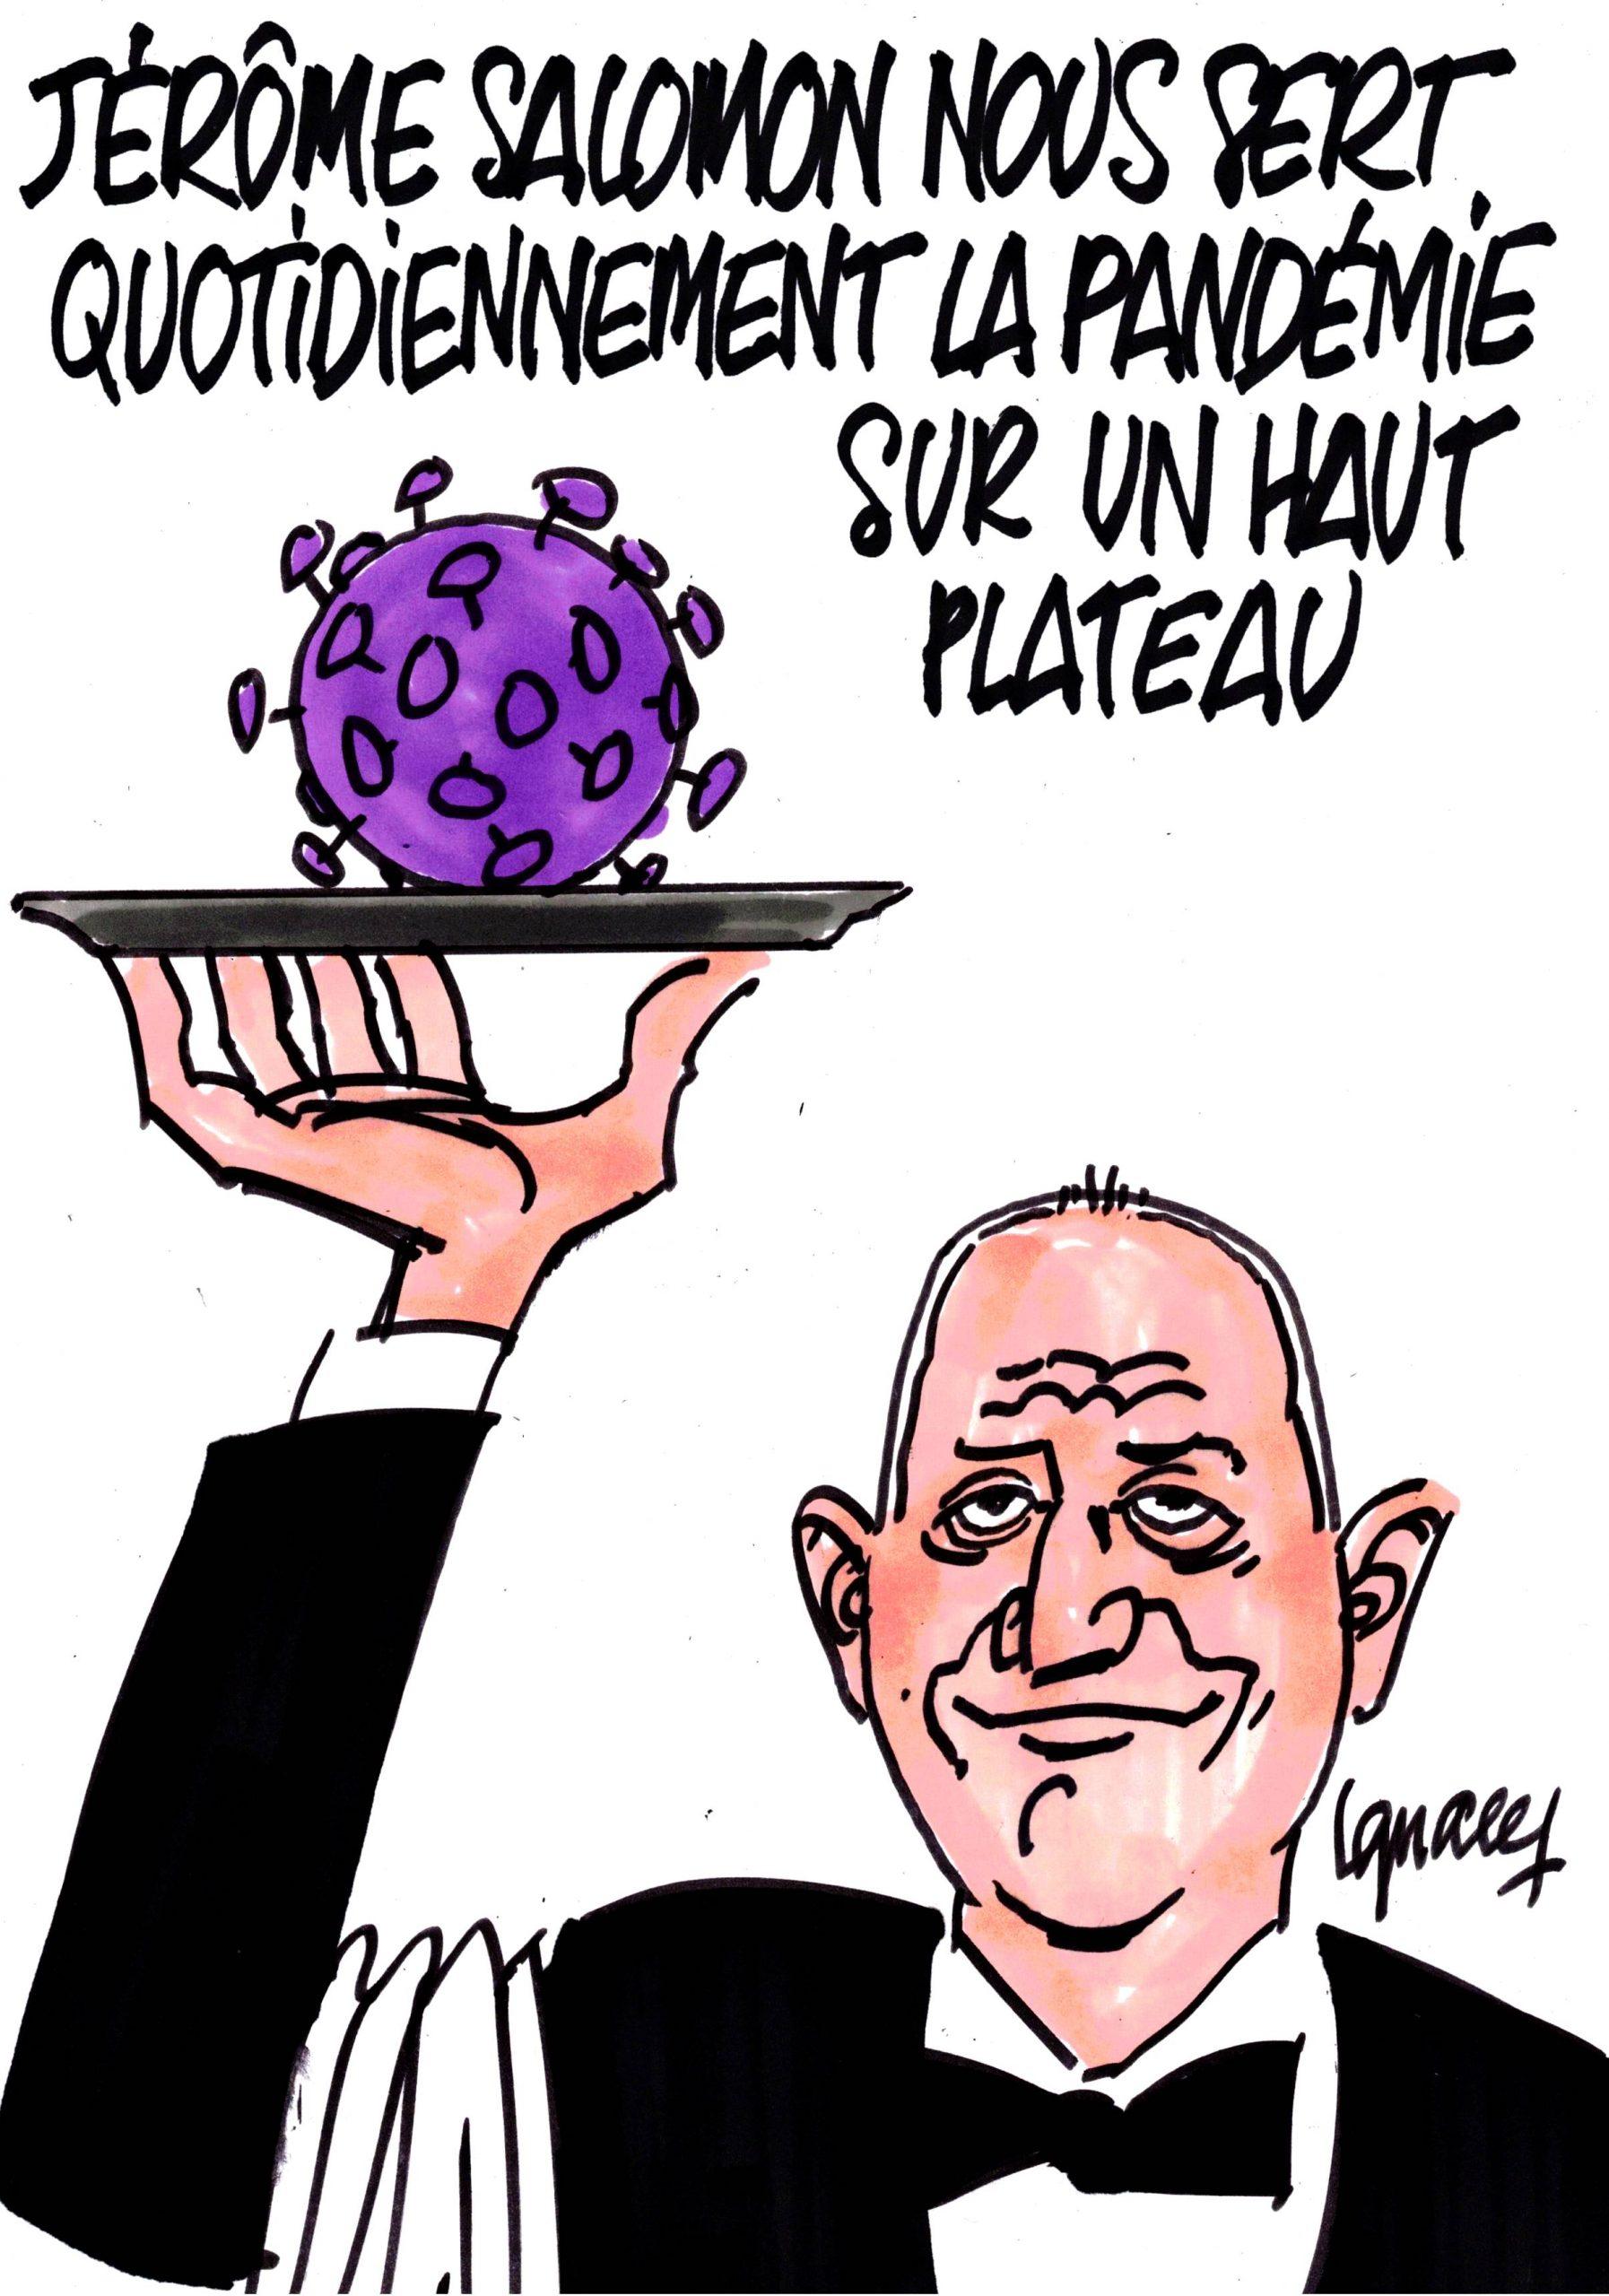 Ignace - Bilan avec Jérôme Salomon